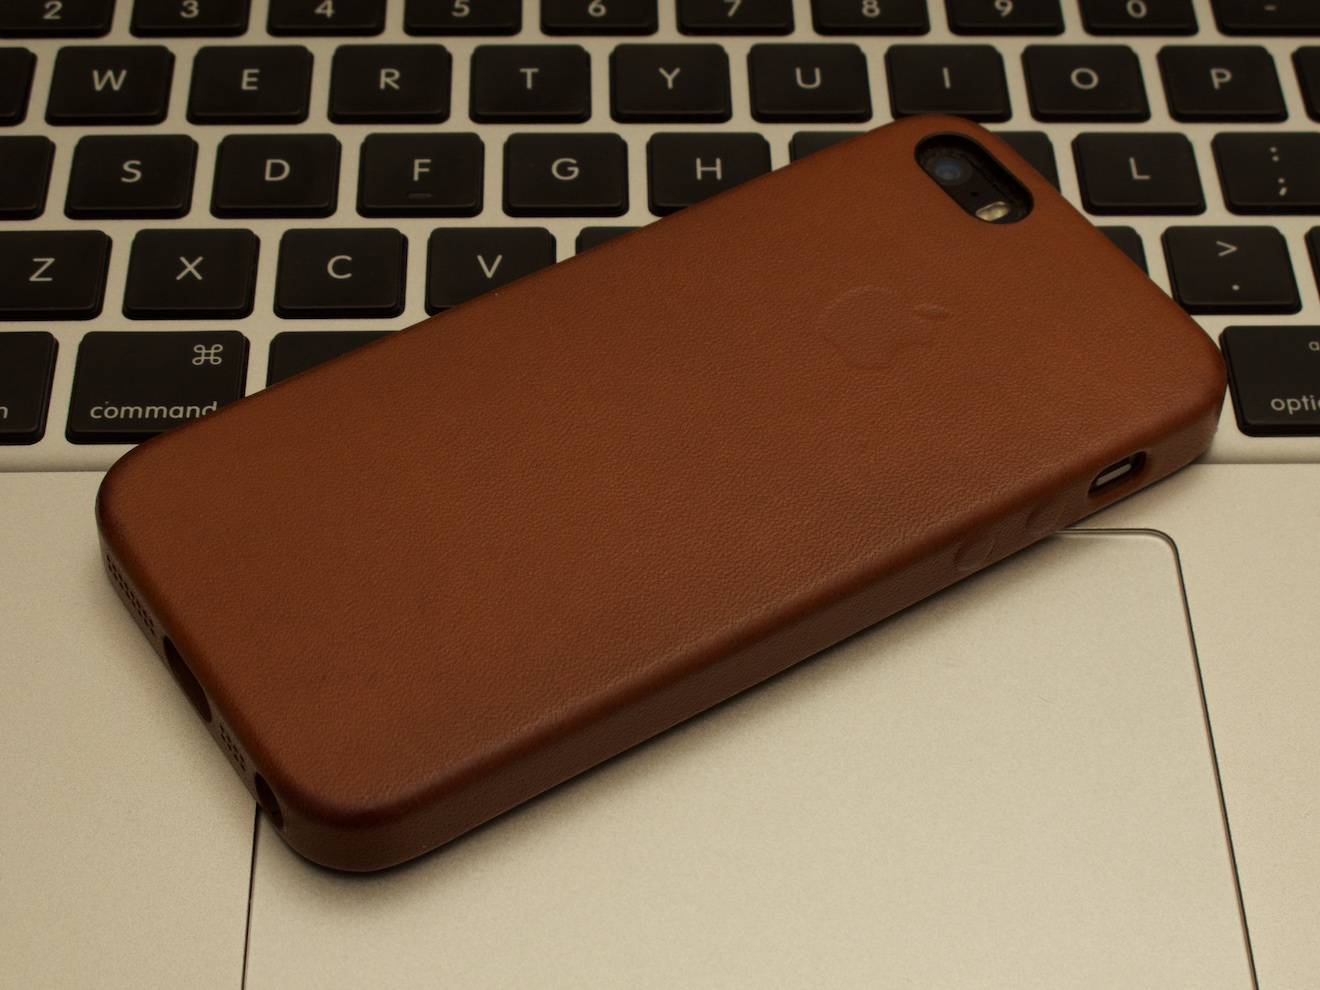 Apple純正 iPhone SE サドルブラウン 経年変化 一年後